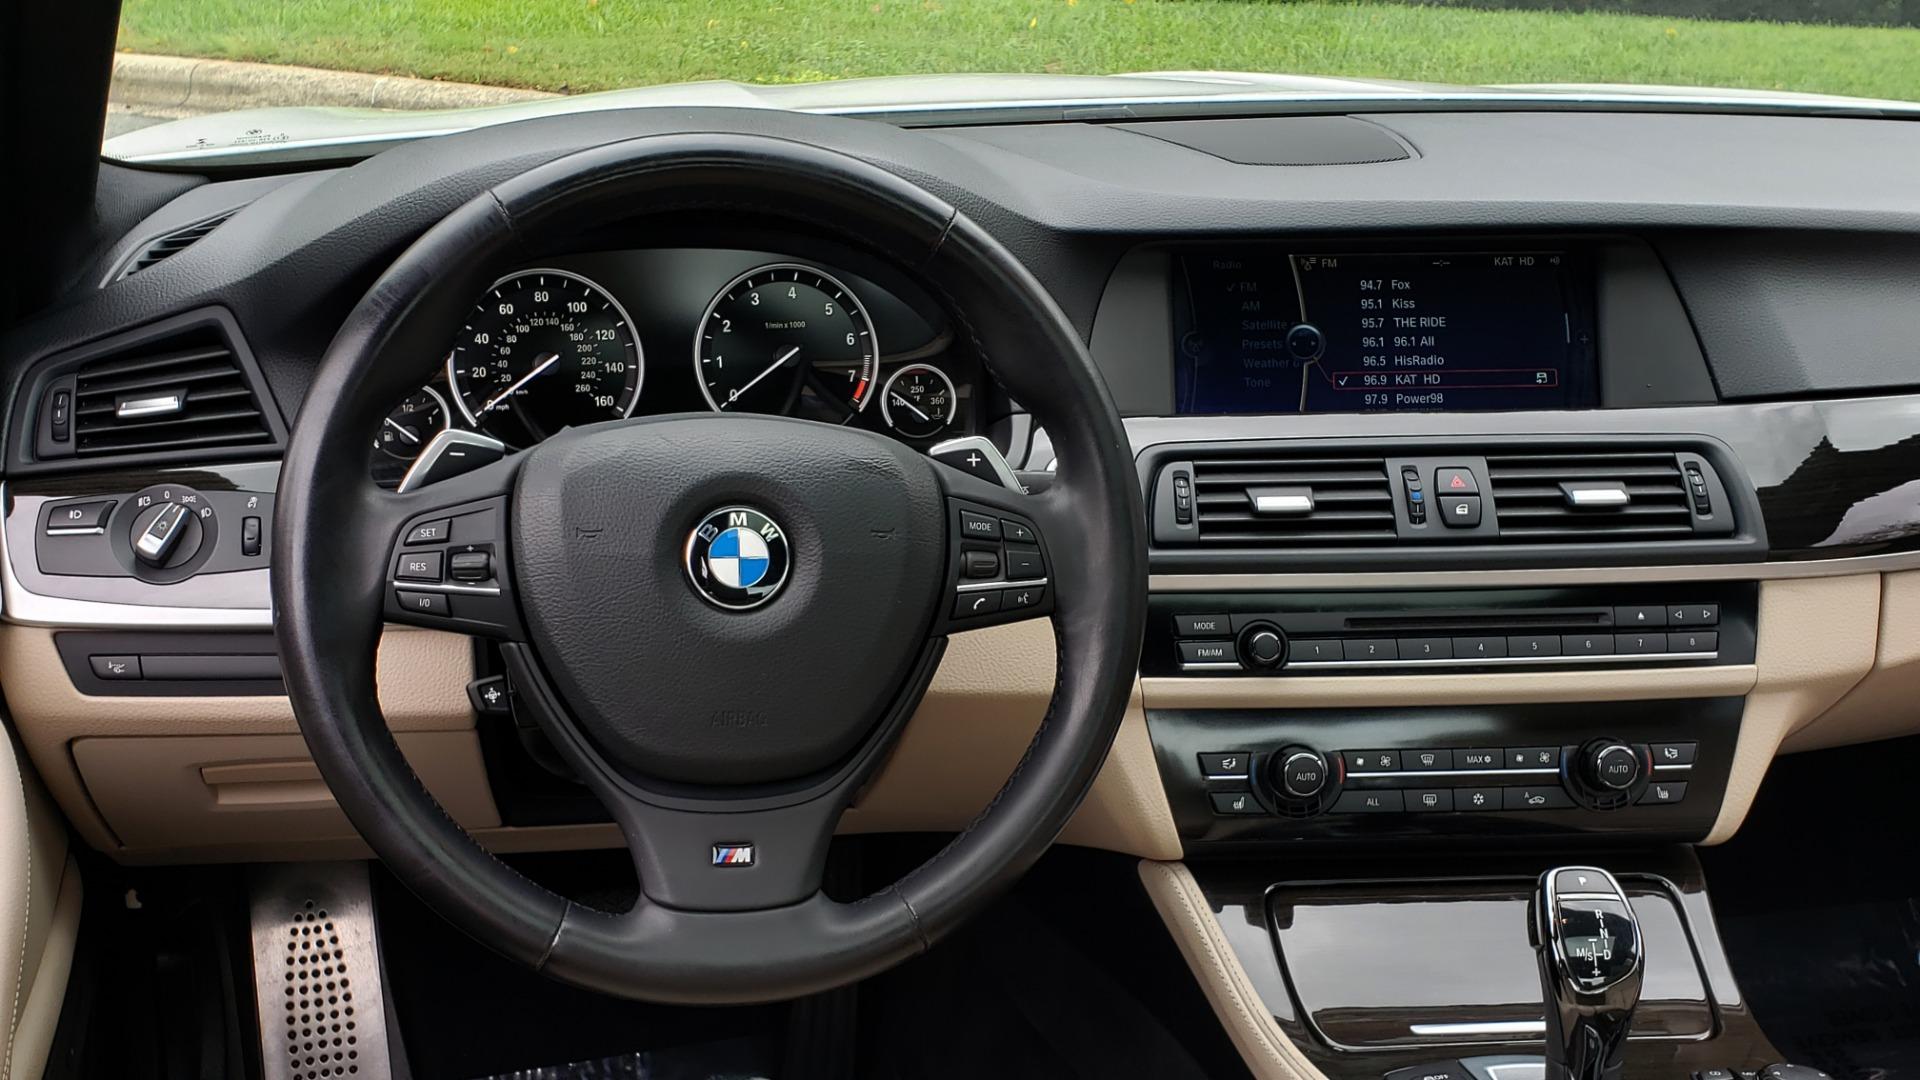 Used 2012 BMW 5 SERIES 550I M SPORT / NAV / CONV PKG / SUNROOF / PREM SND / REARVIEW for sale Sold at Formula Imports in Charlotte NC 28227 28